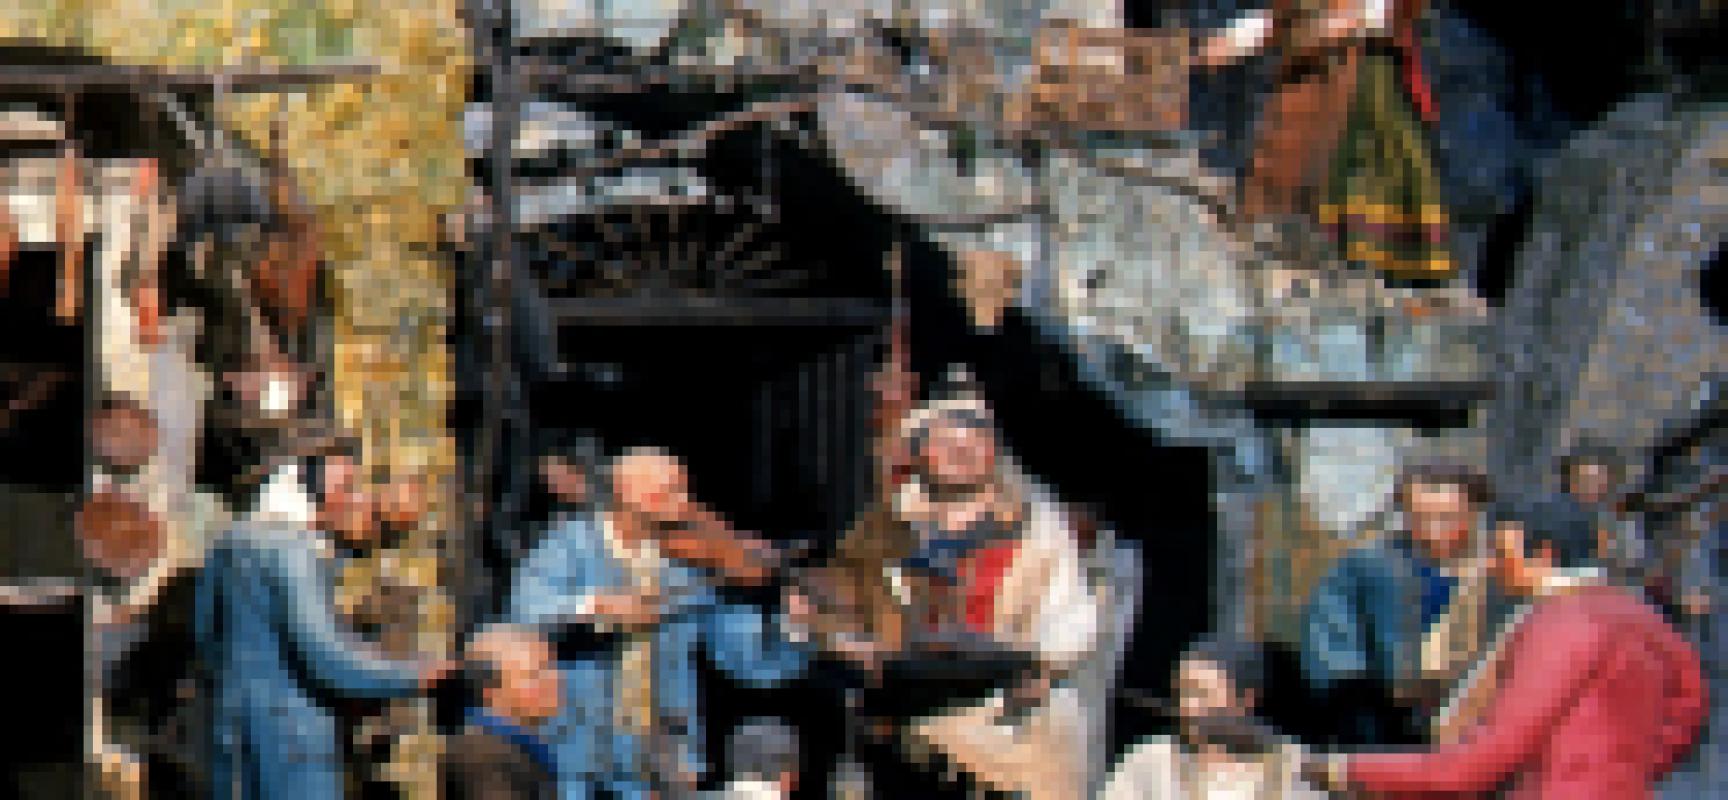 Immacolata, Campania apre i suoi Musei